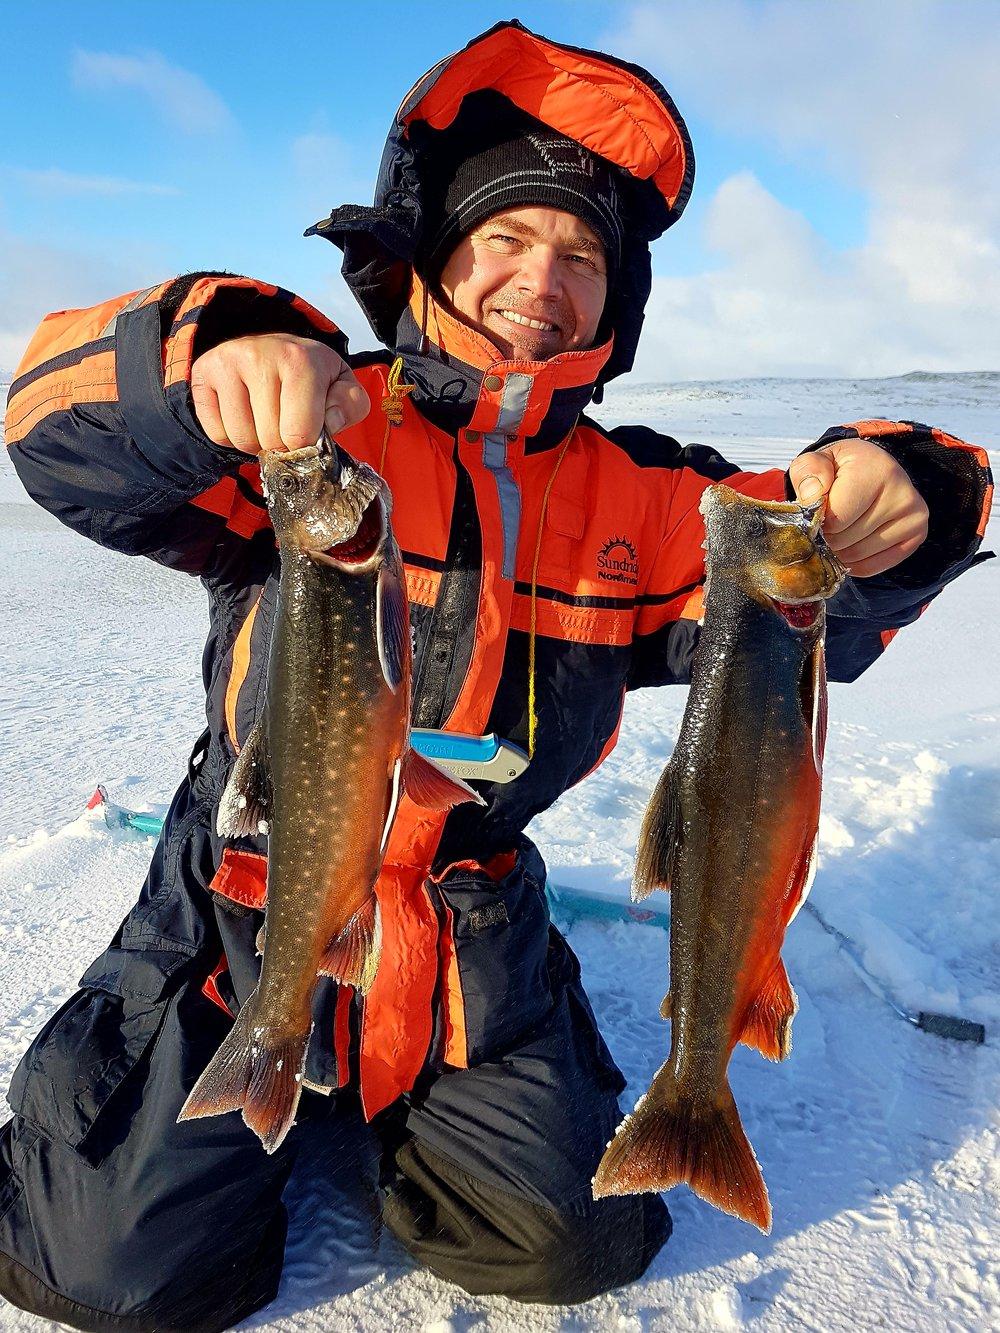 11 - BILDER - Vinter Foto_ Kenneth Østreng Isfiske røye fiskefangst røyefangst fornøyd fisker.jpg